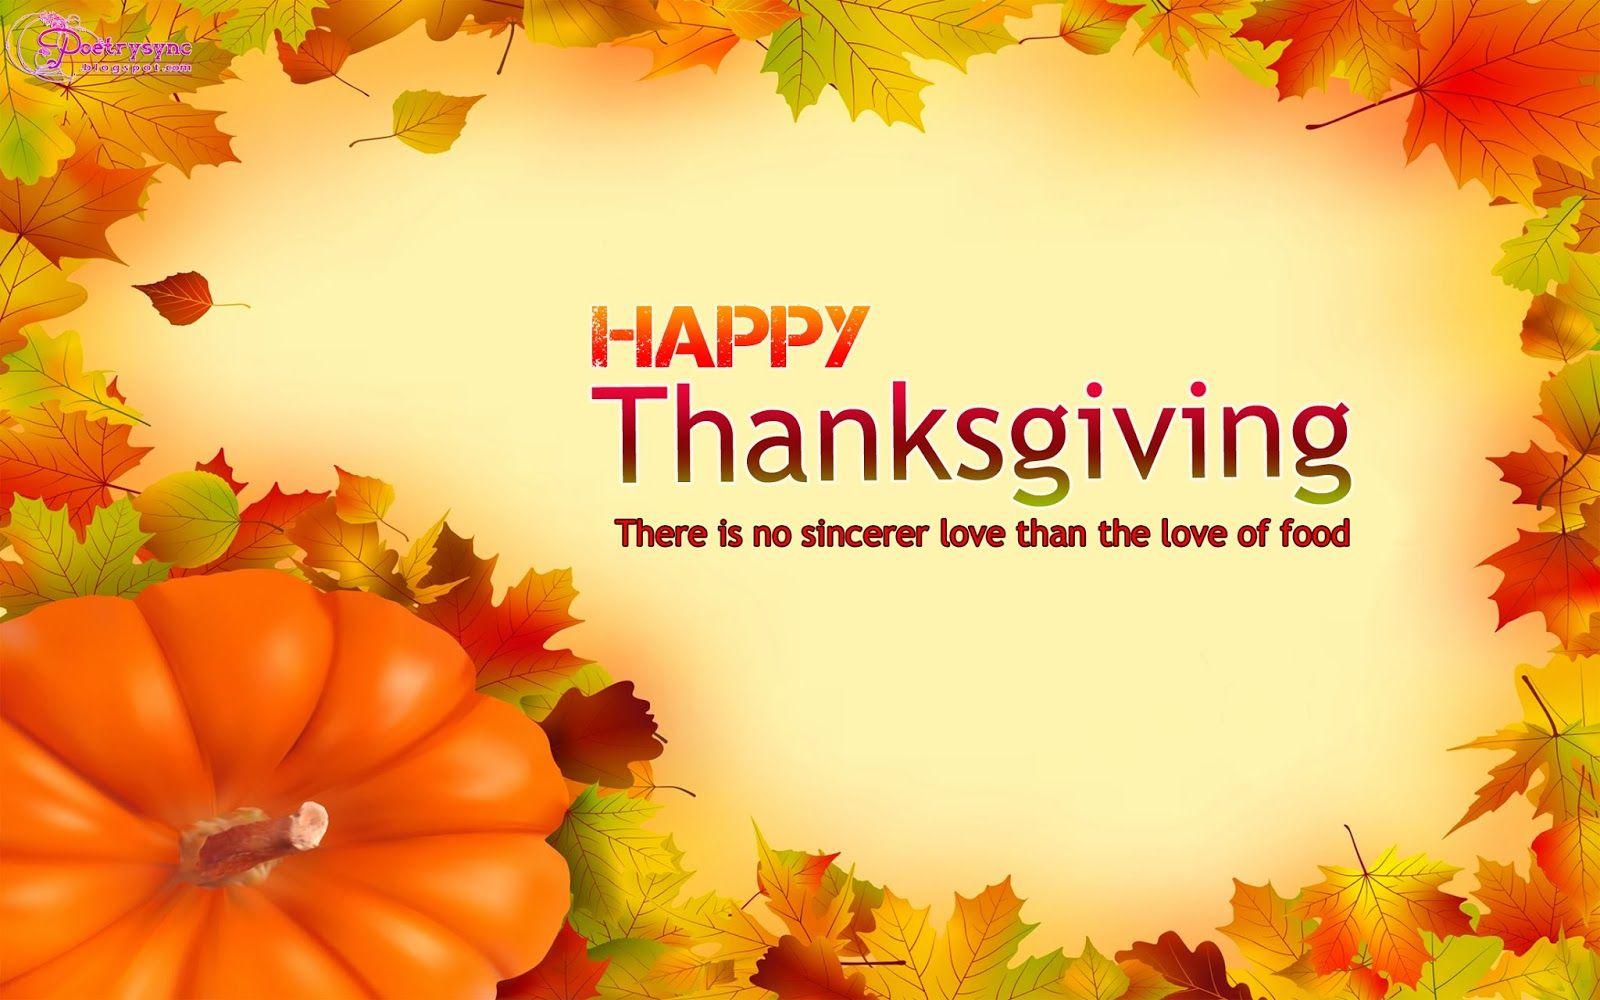 Thanksgiving Turkey Day Wishes | Thanksgiving Day | Pinterest ...